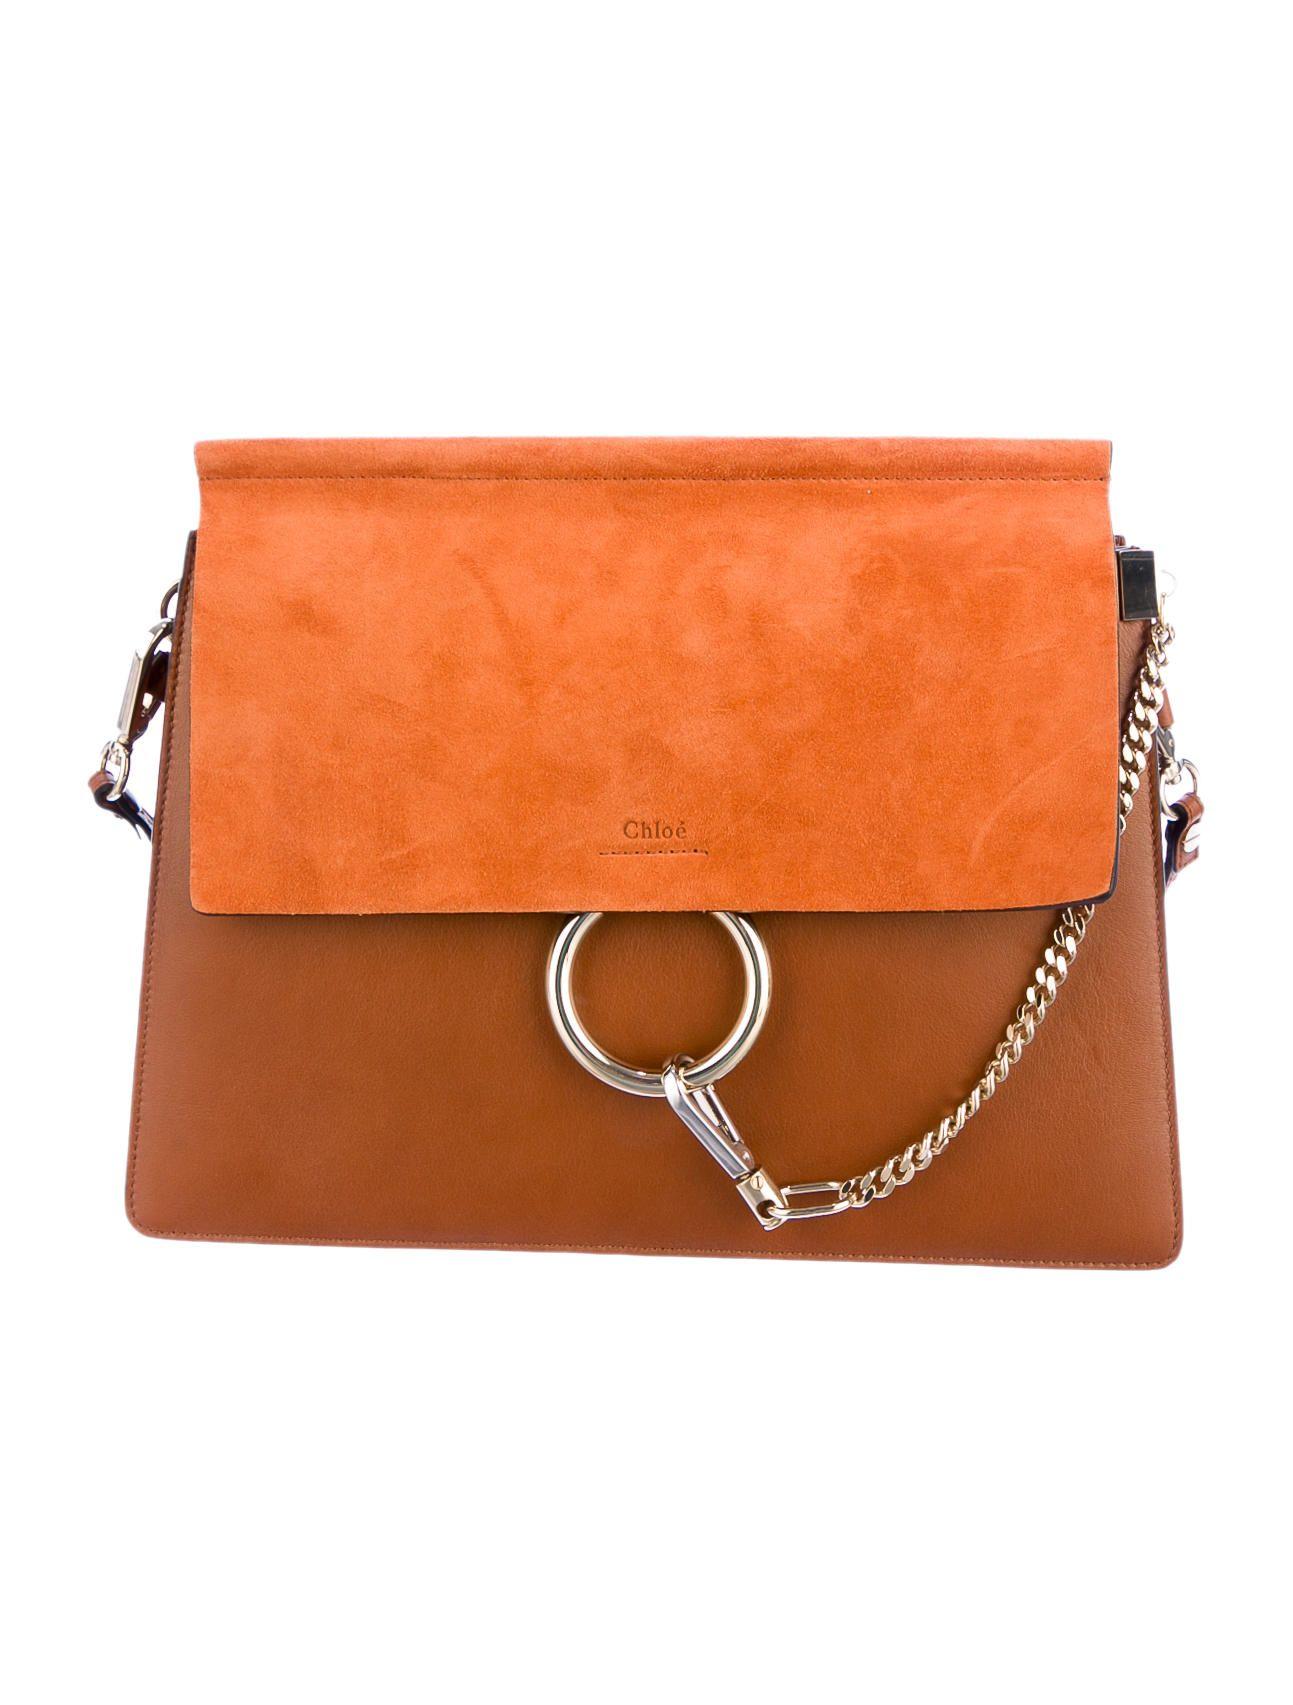 0413ac8ece0 Chl27309_1_enlarged Chloe Handbags, Handbags On Sale, Brown Leather, Tan  Leather, Brown Skin